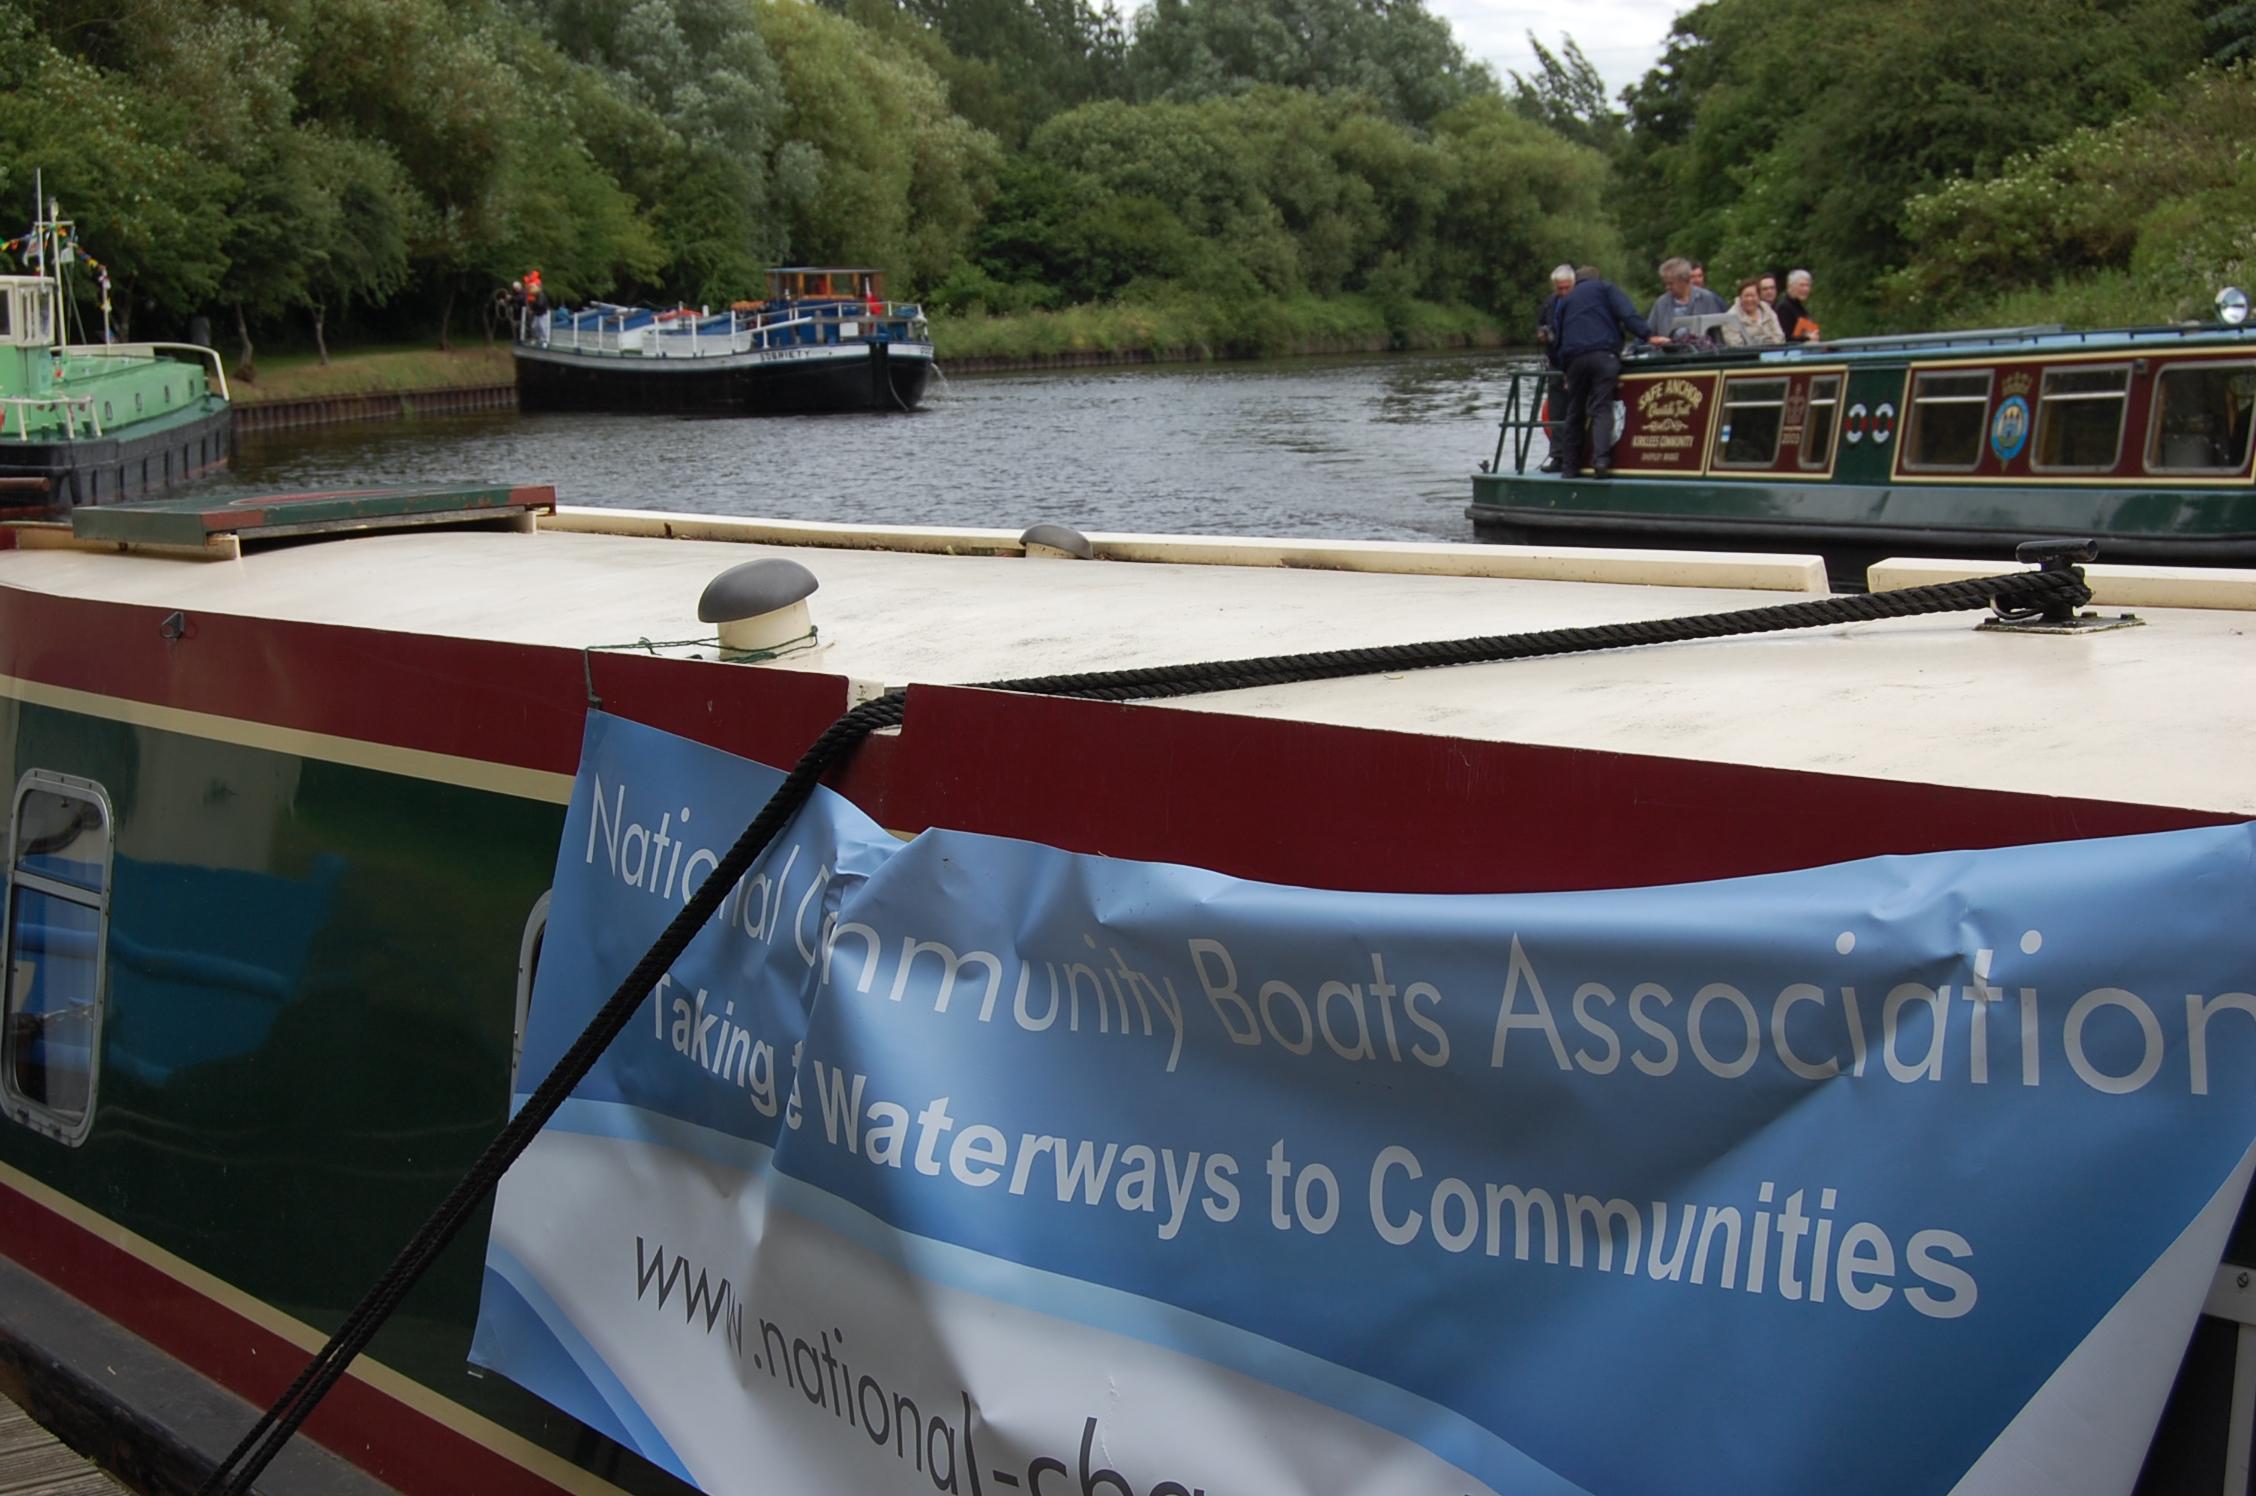 Community boat